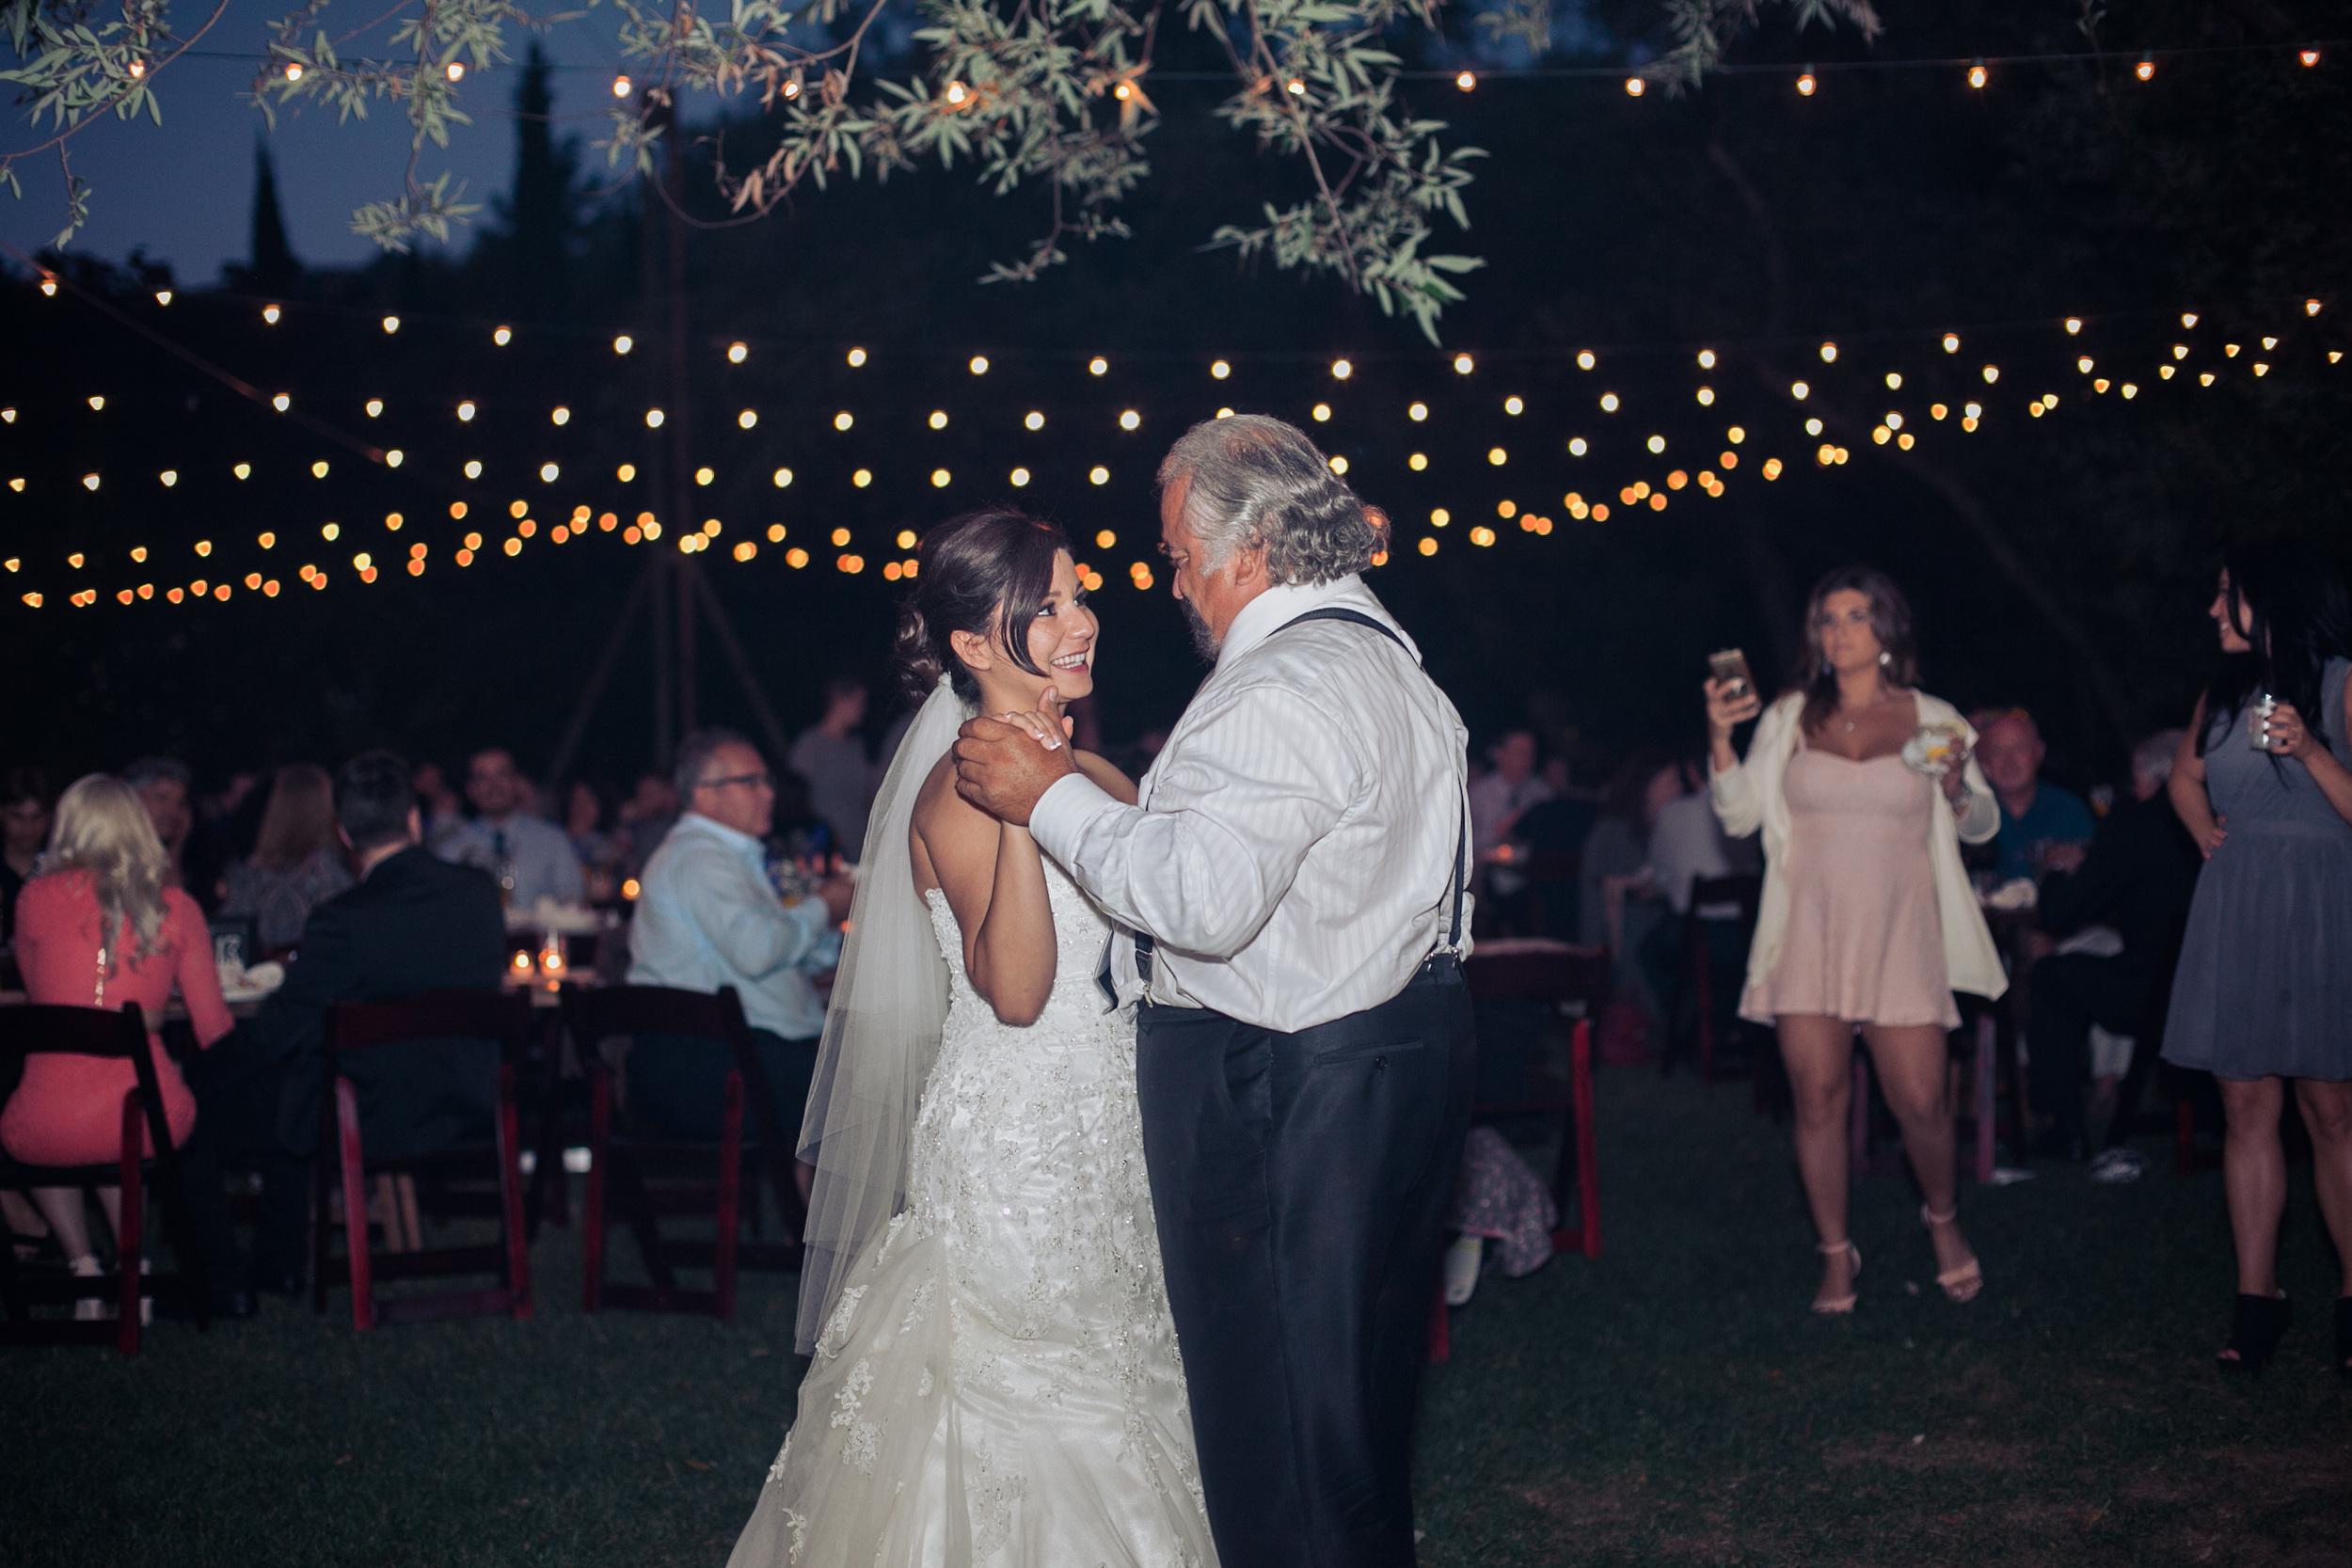 father daughter dane outdoor wedding bistro lights